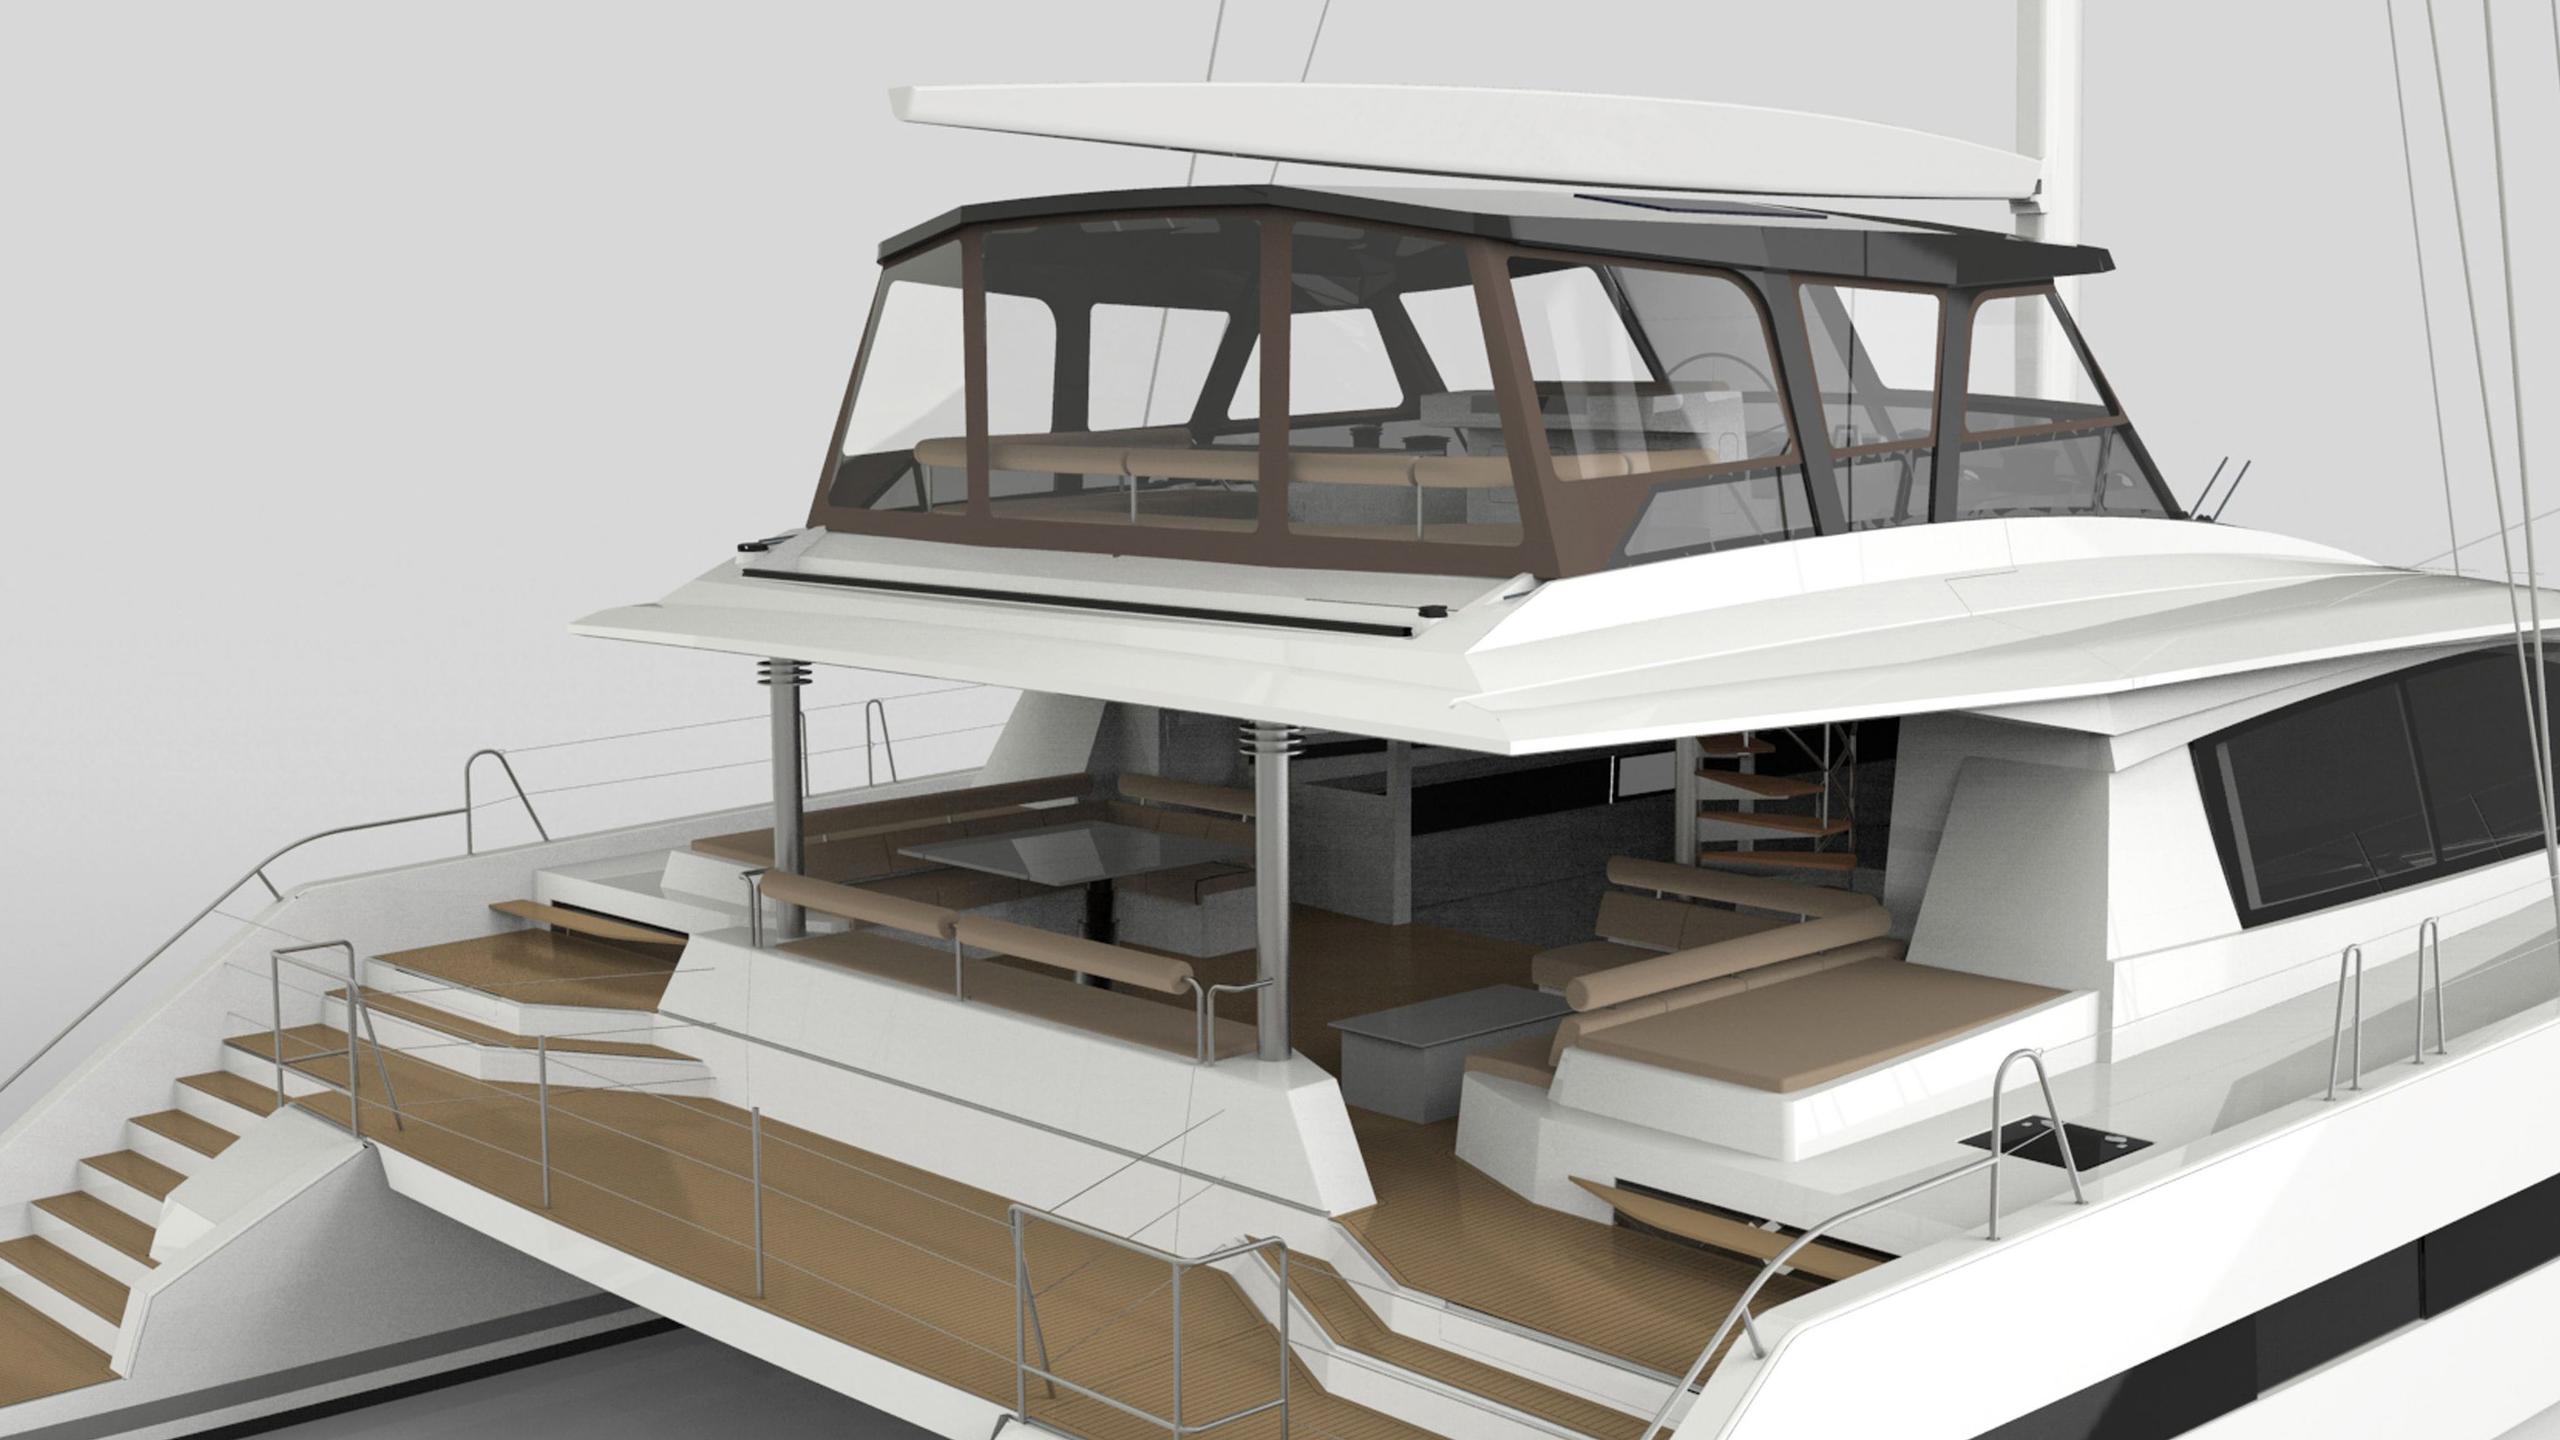 long island 85 hull 2 catamaran sailing yacht jfa yachts 26m 2017 sundeck rendering